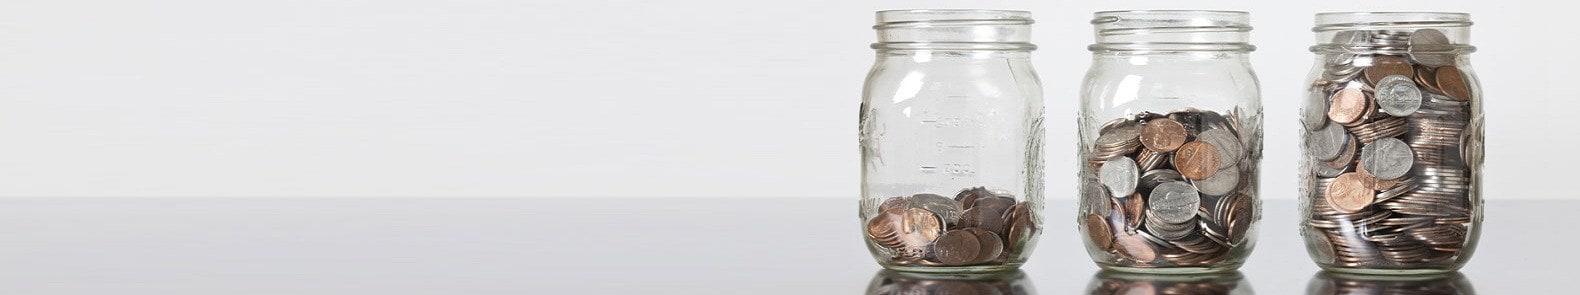 Bd save savings easy saver masthead